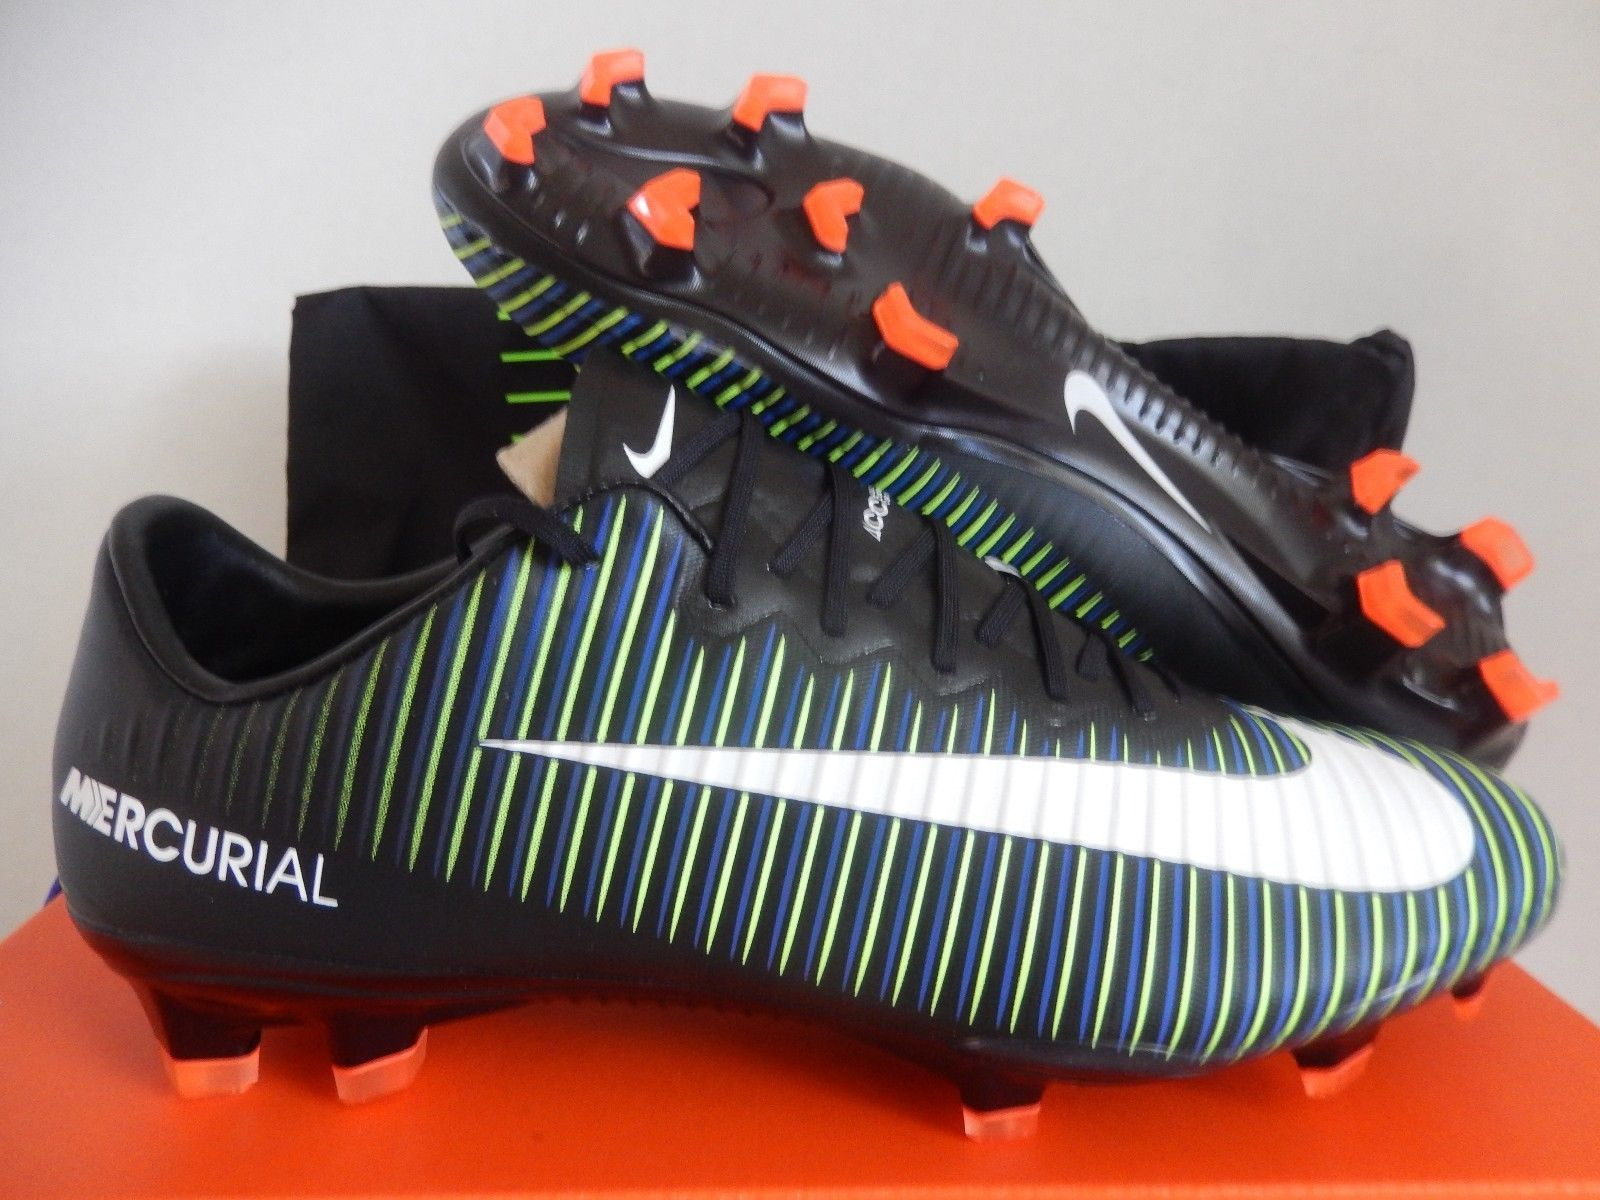 Nike Mercurial Vapor Xi Fg Black White Electric Green Sz 8 5 831958 013 Tenis